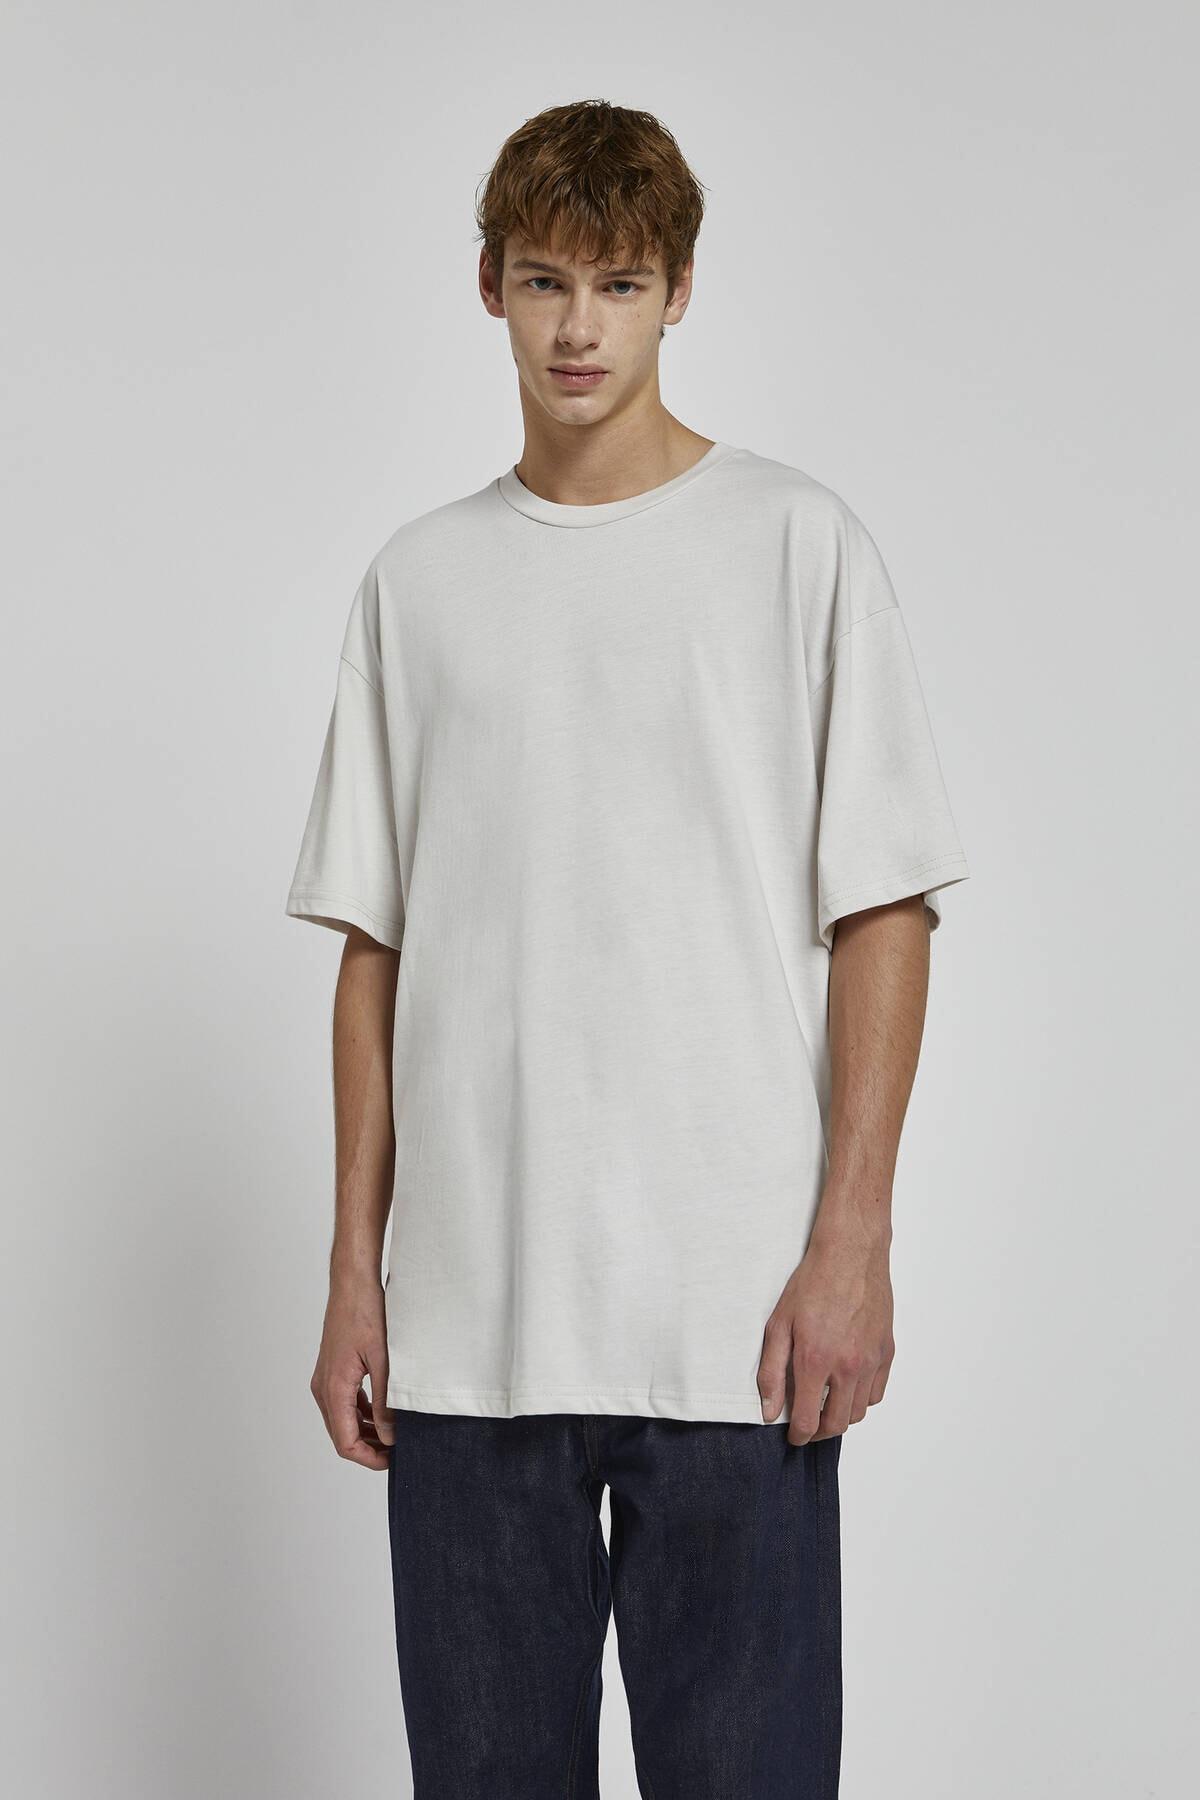 Pull & Bear Erkek Açık Gri Kısa Kollu Oversize T-Shirt 09244936